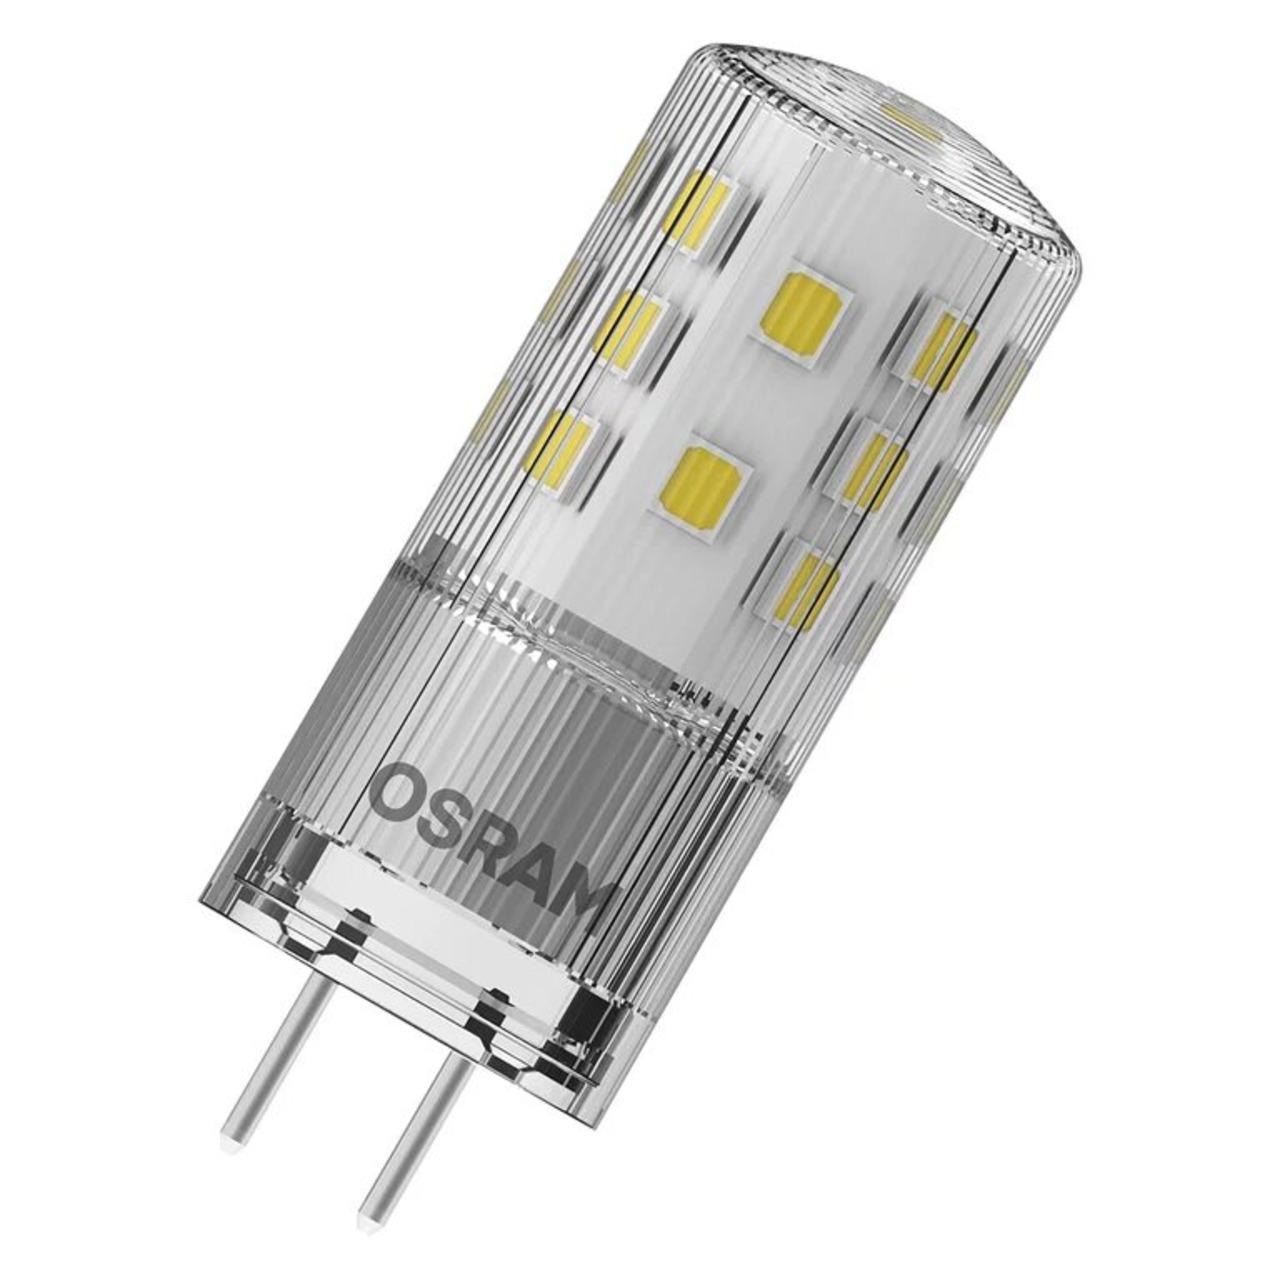 OSRAM 3-3-W-LED-Lampe T18- GY6.35- 400 lm- warmweiss- 320°- 12 V